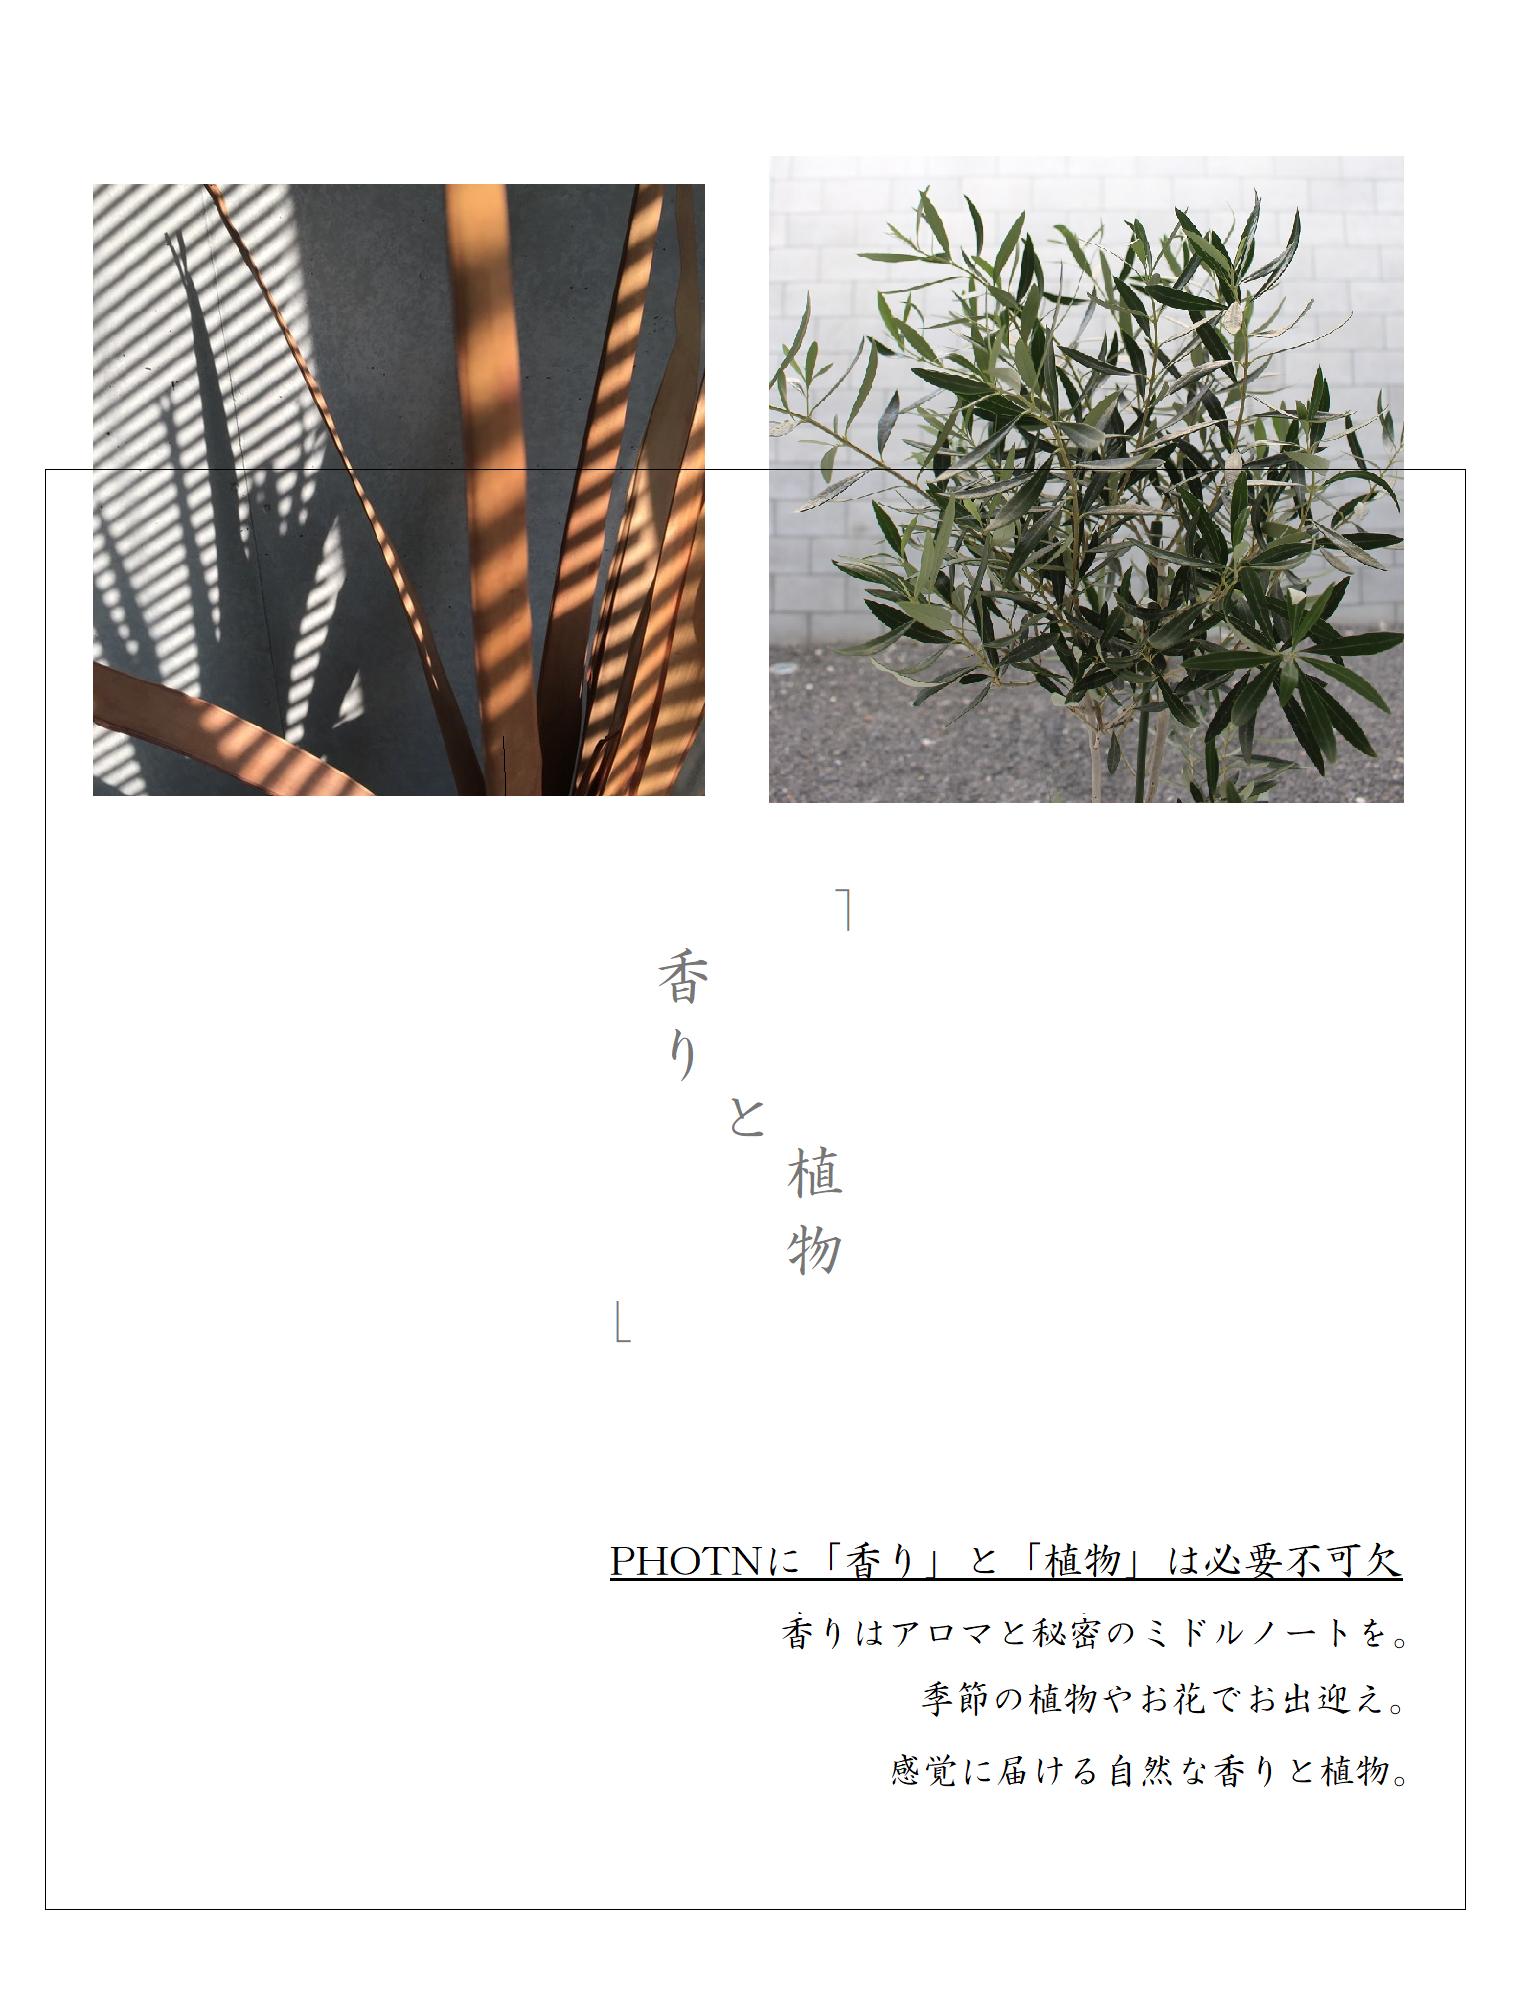 │ PHOTON ( フォトン )│private nail art lab Tokyo│ プライベート ネイル サロン │ 明大前  東京